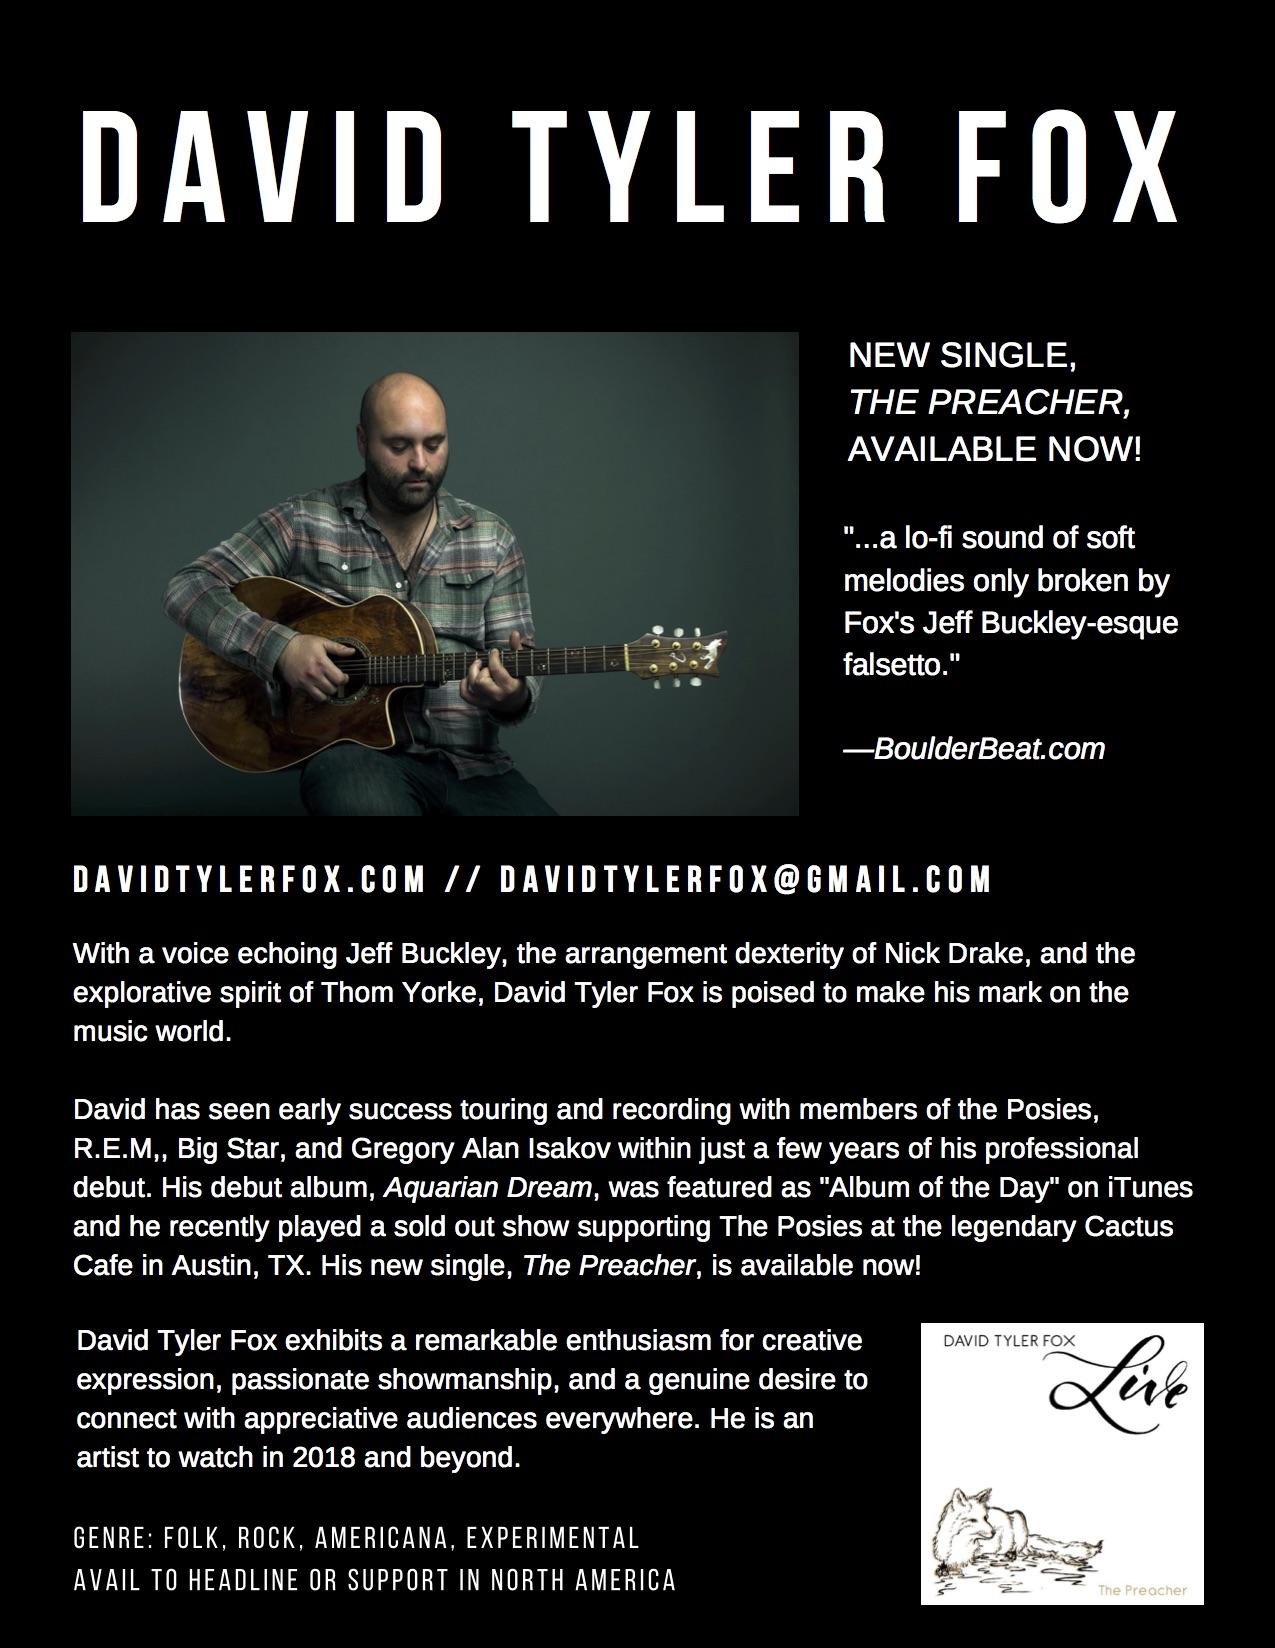 DAVID TYLER FOX.jpg